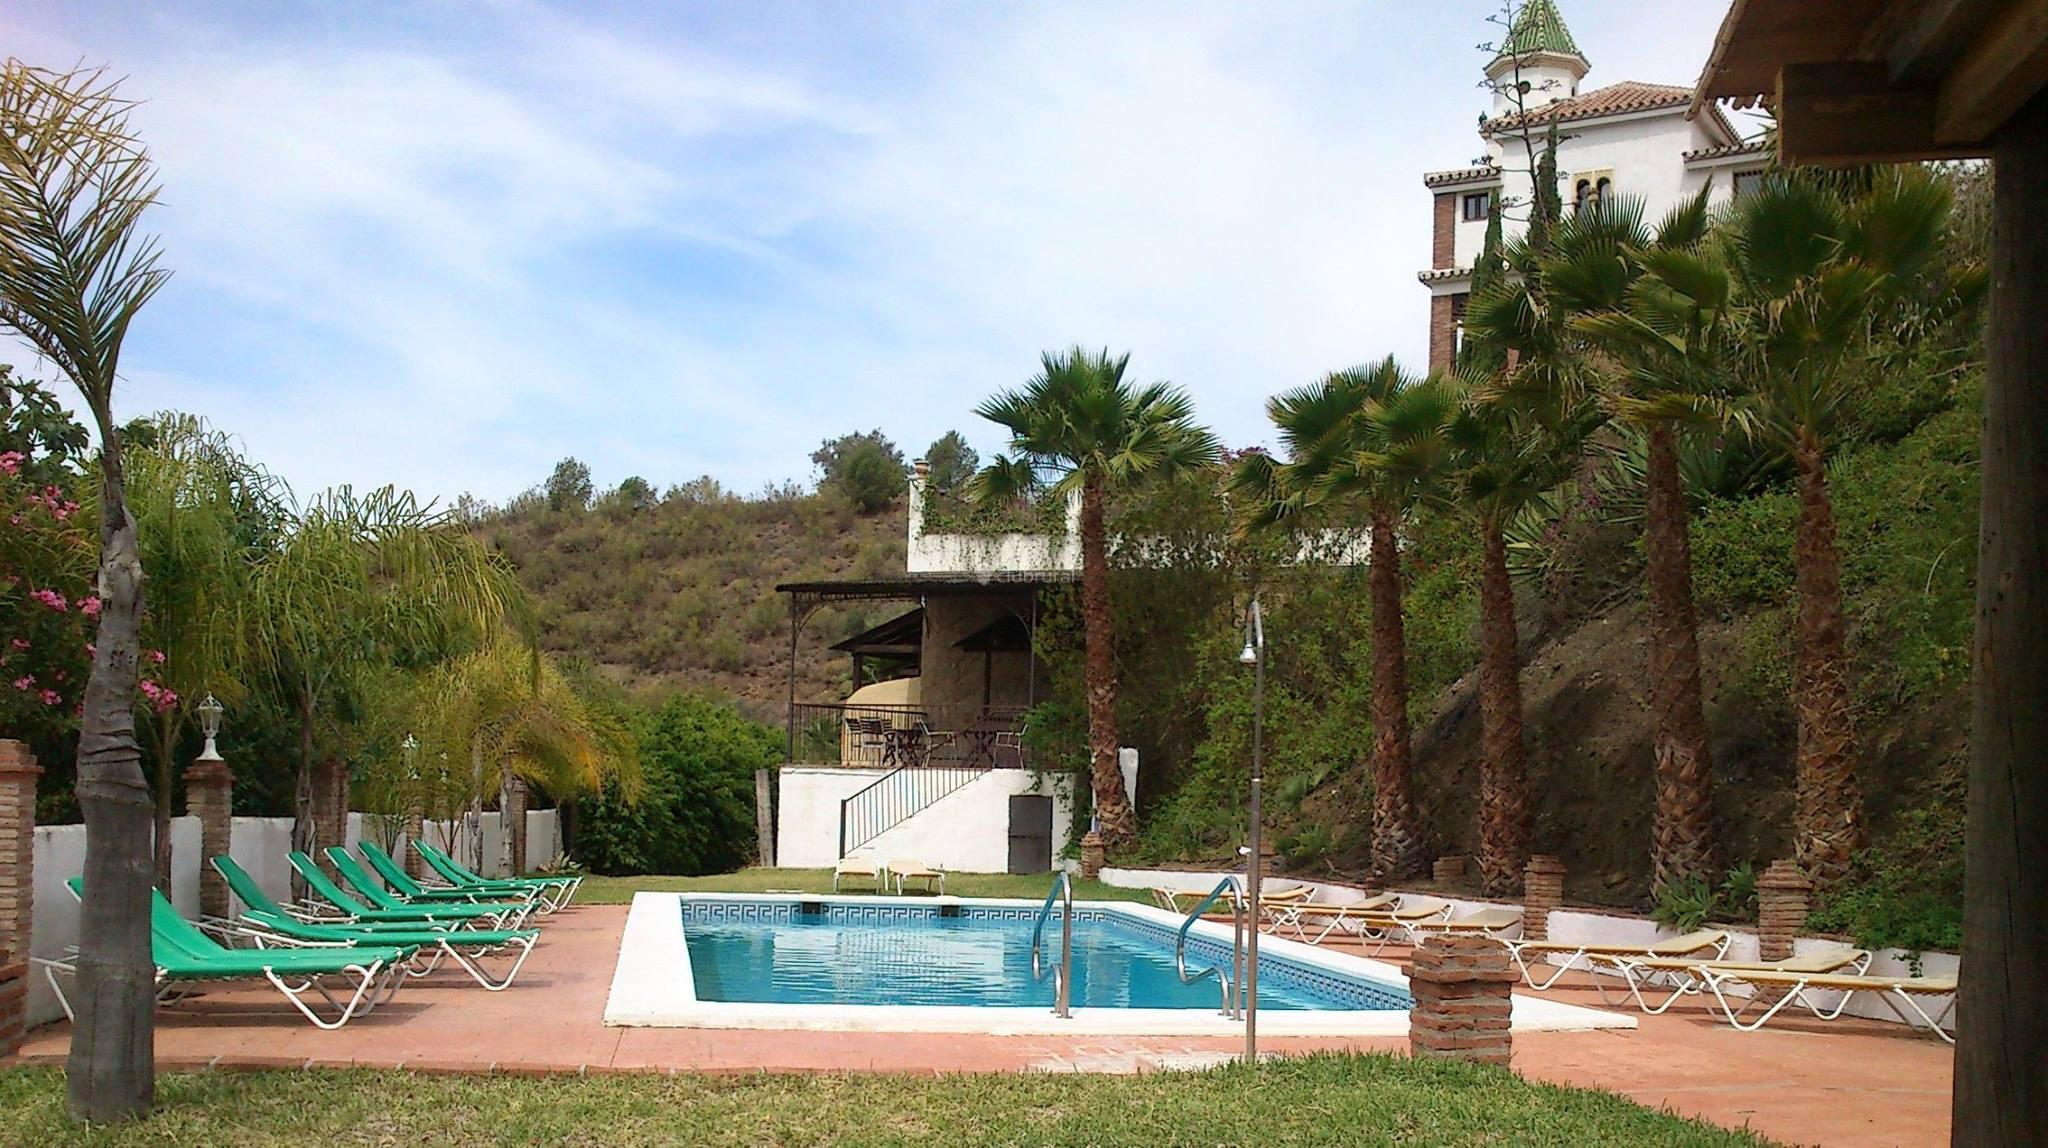 Fotos de hotel cortijo molino de santillan m laga - Casa rural iznate ...